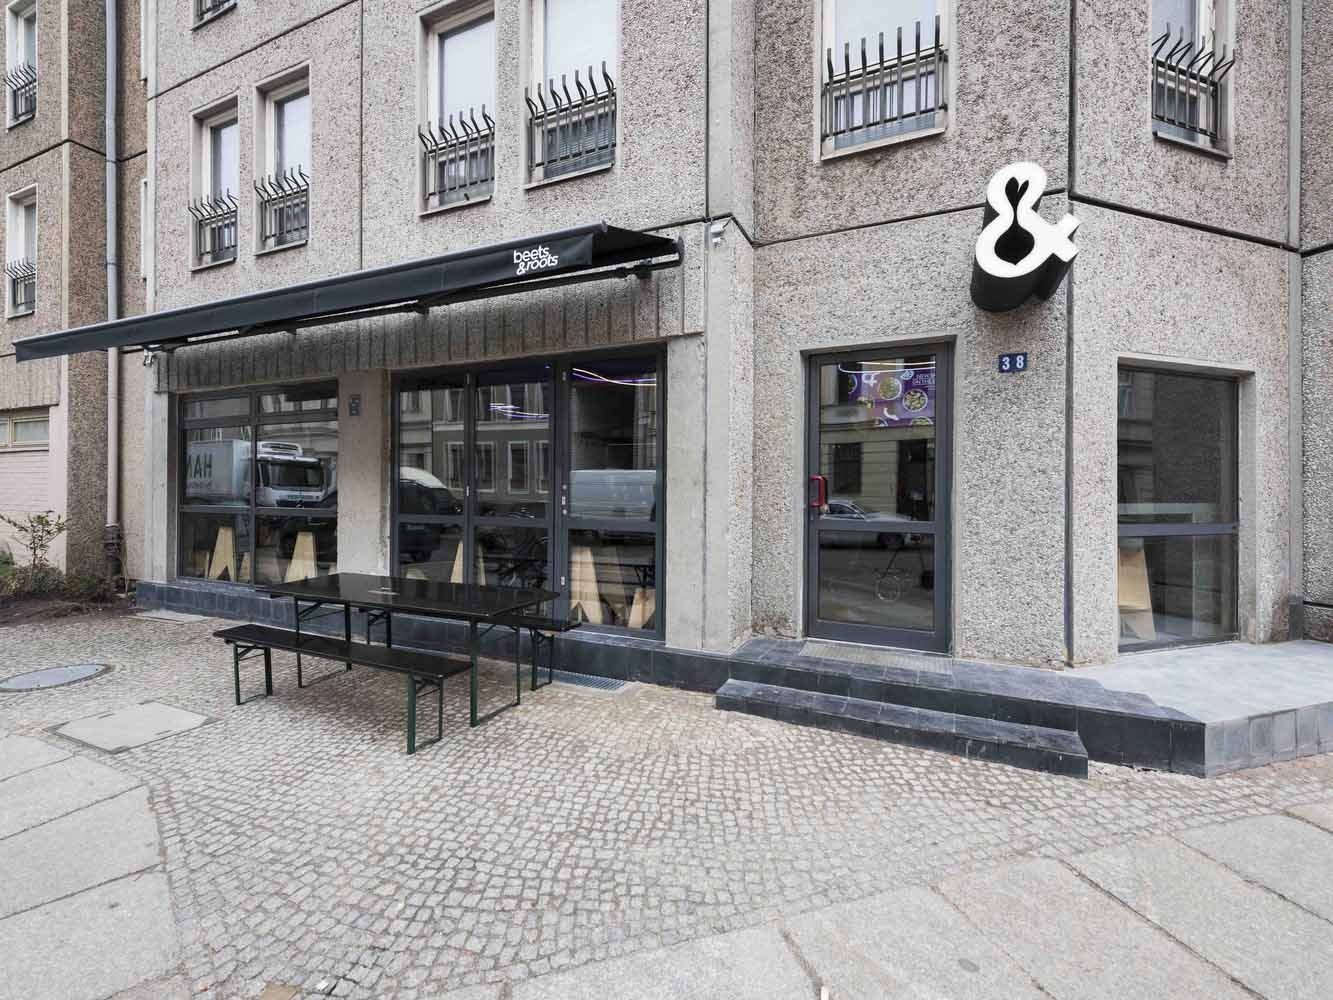 طراحی رستوران بیتز و روتز Beets & Roots برلین / مهندس معمار گونزالس هاسه Gonzalez Haase